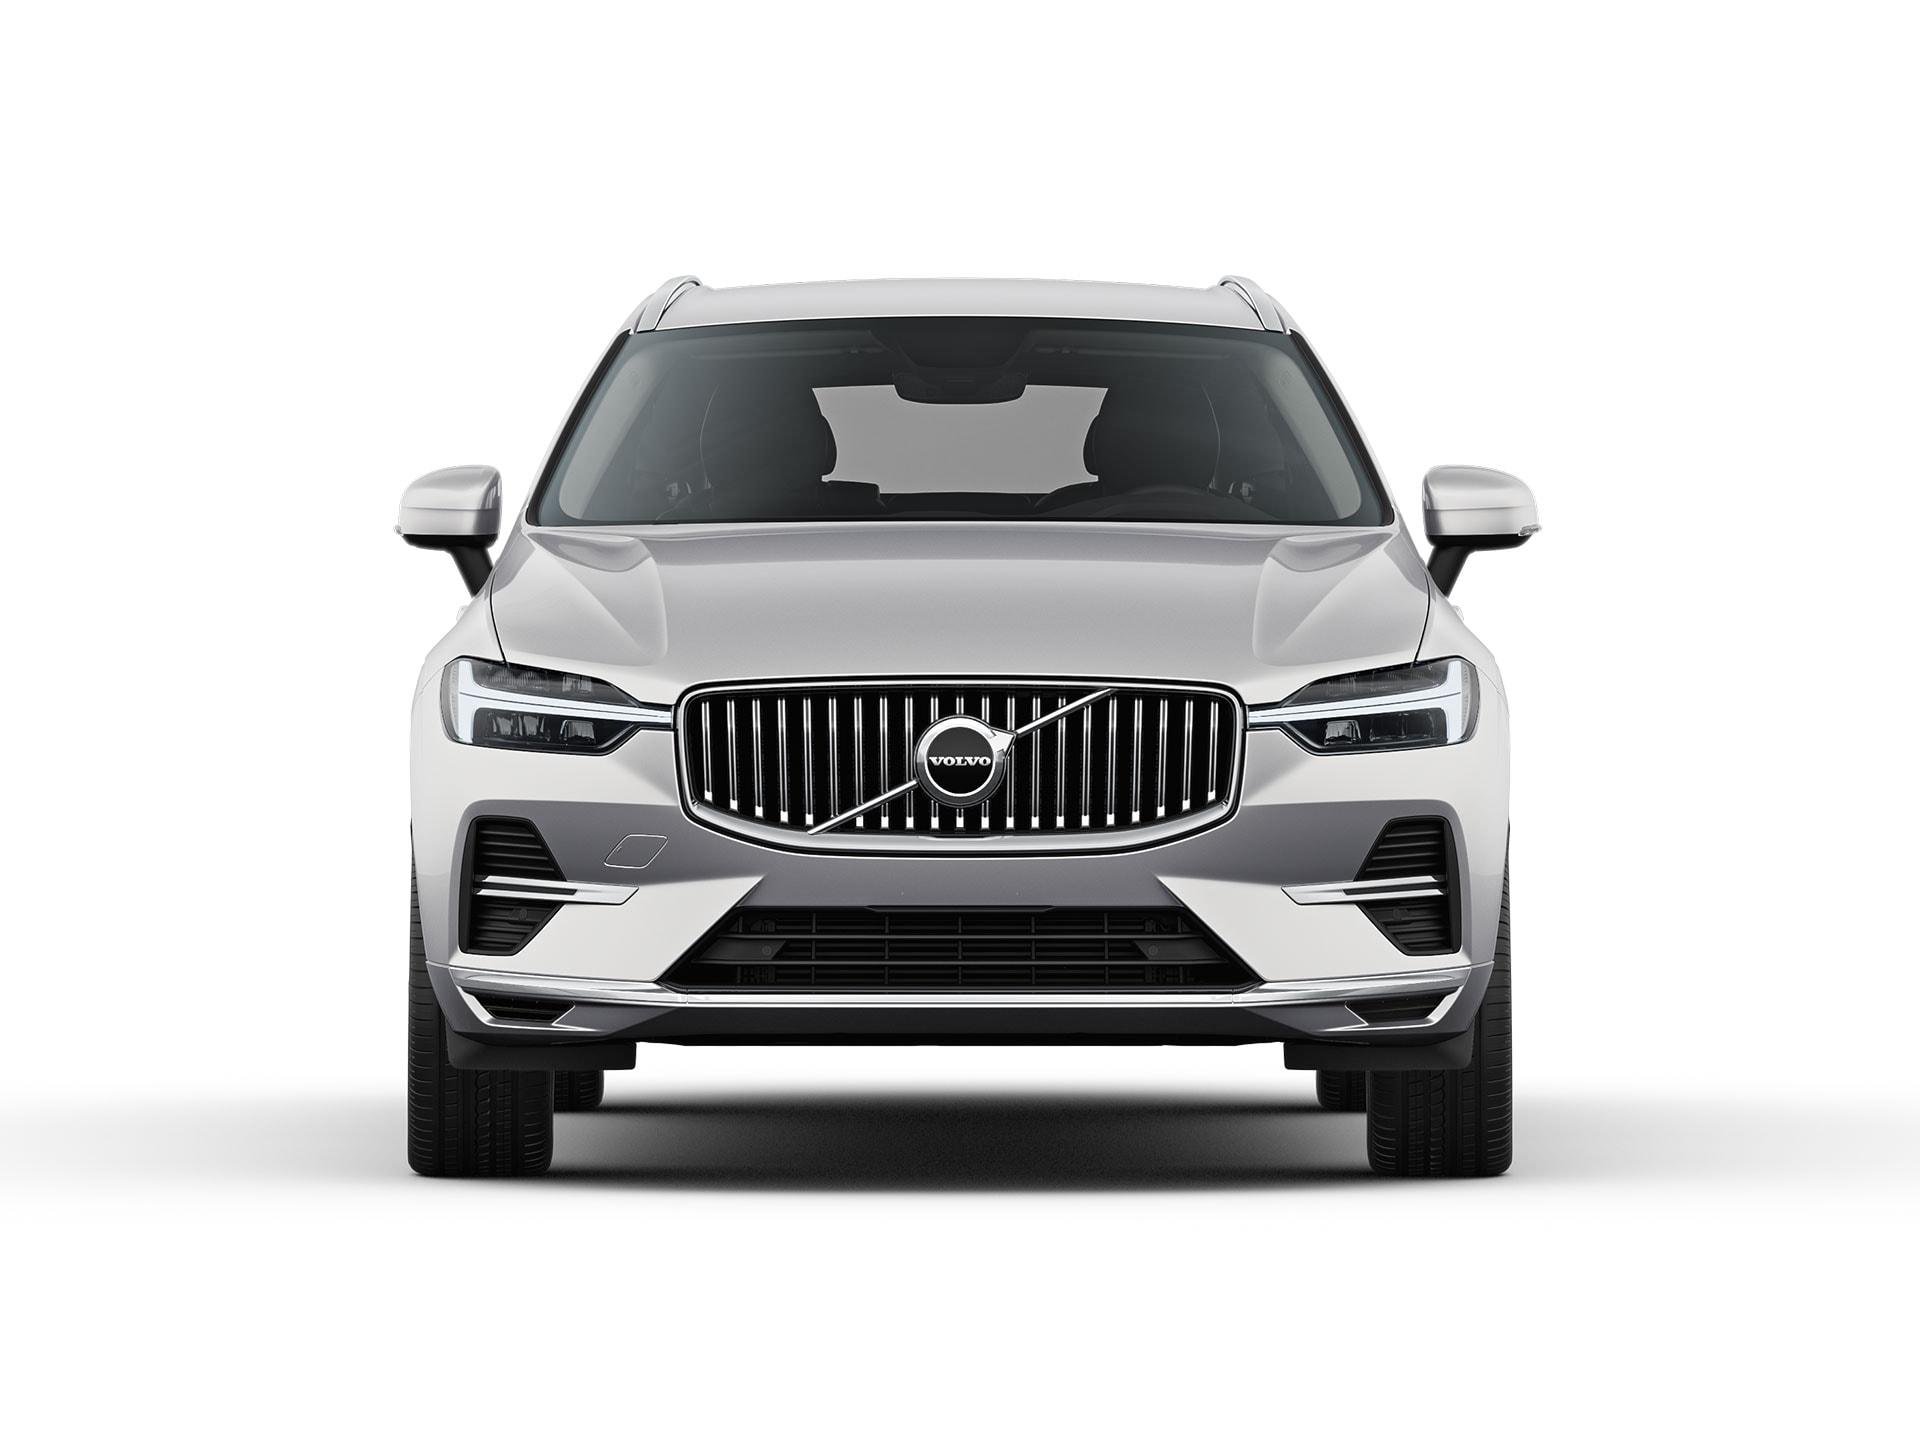 Avant d'un SUV moyenne gamme Volvo XC60.